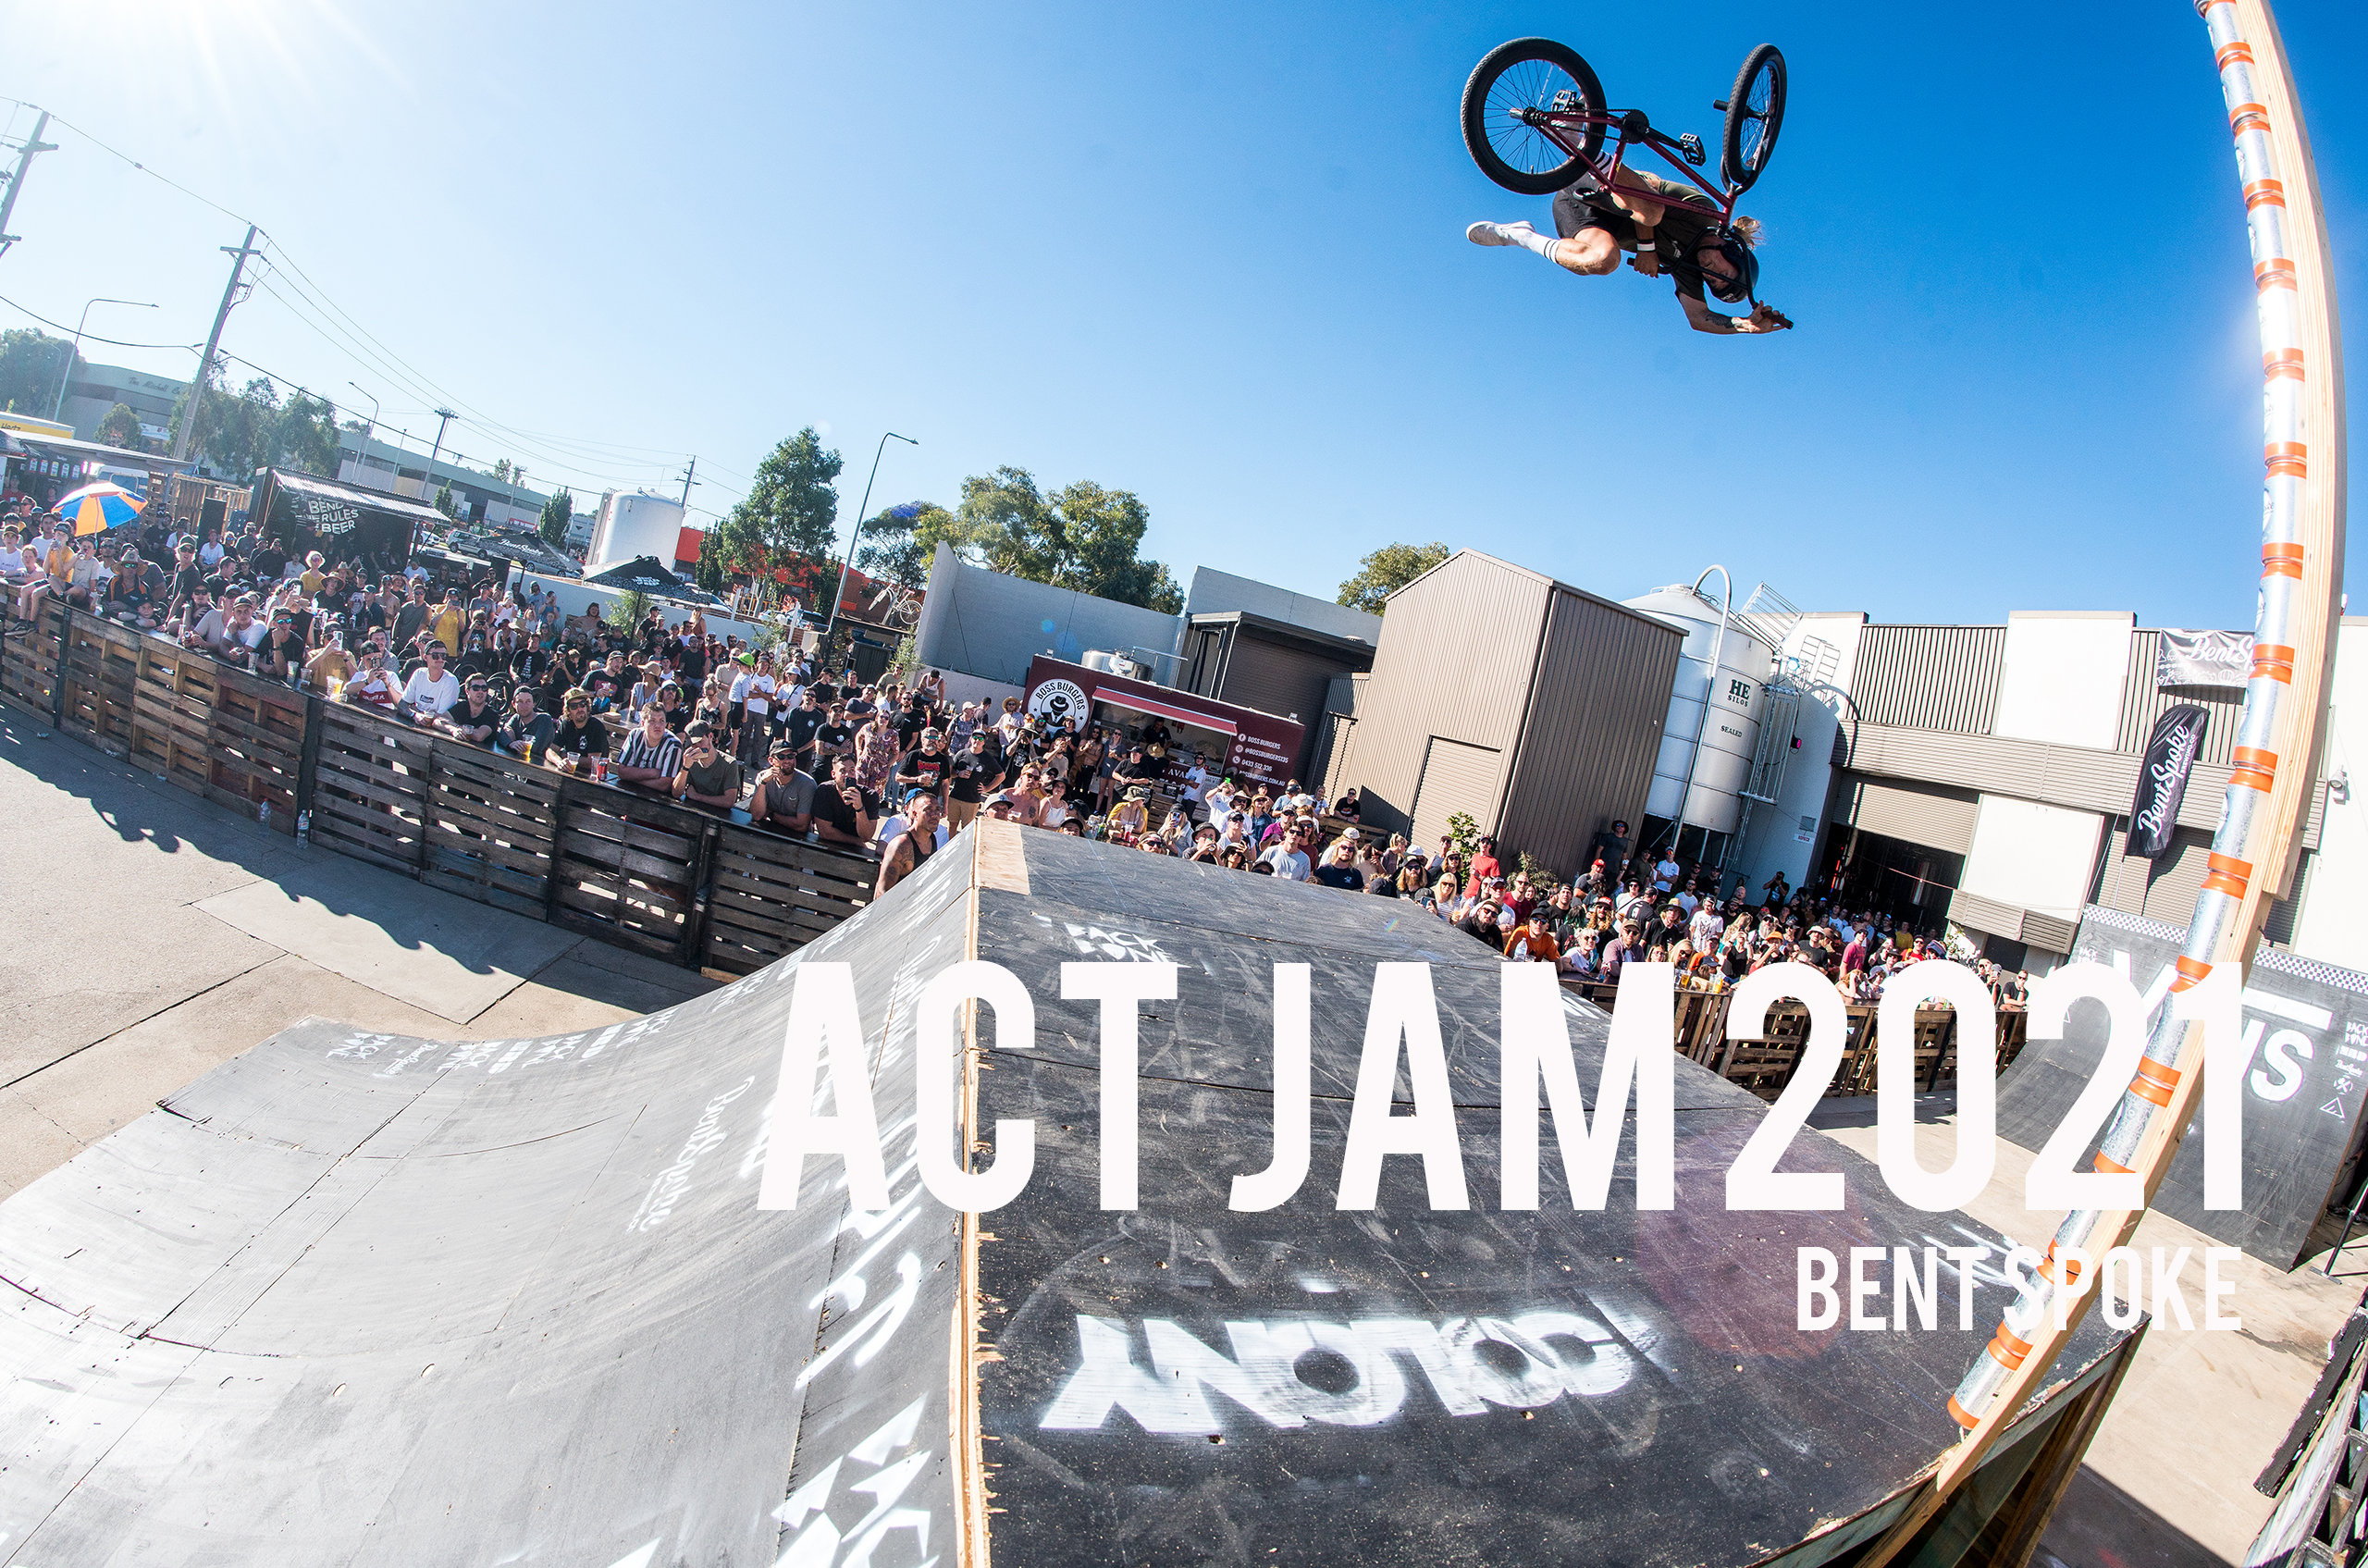 ACT JAM 2021 BENT SPOKE